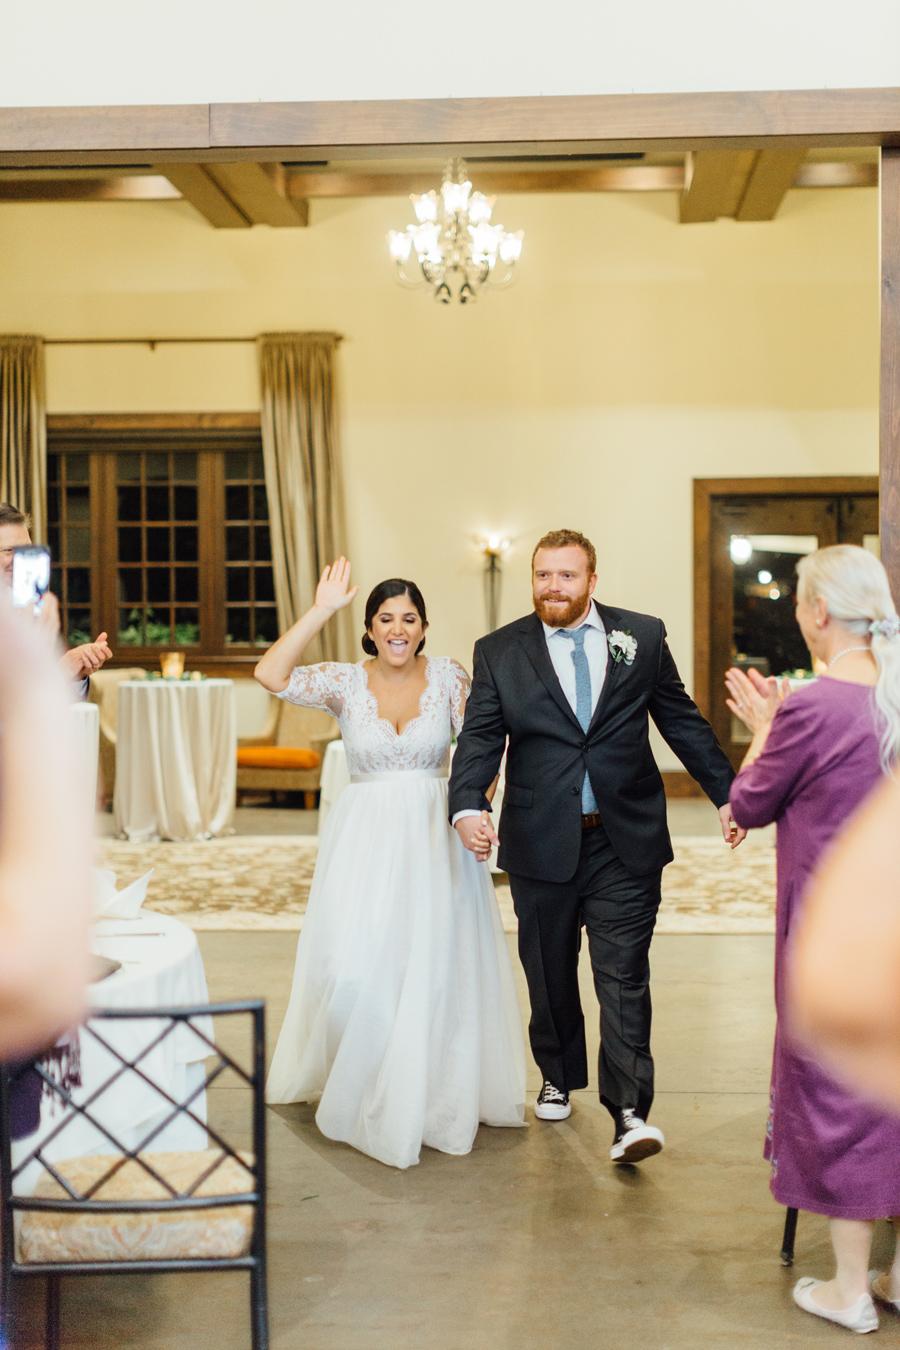 the-inn-at-leola-wedding-lancaster-pennsylvania-wedding-photographer-rebeka-viola-photograhy (106).jpg